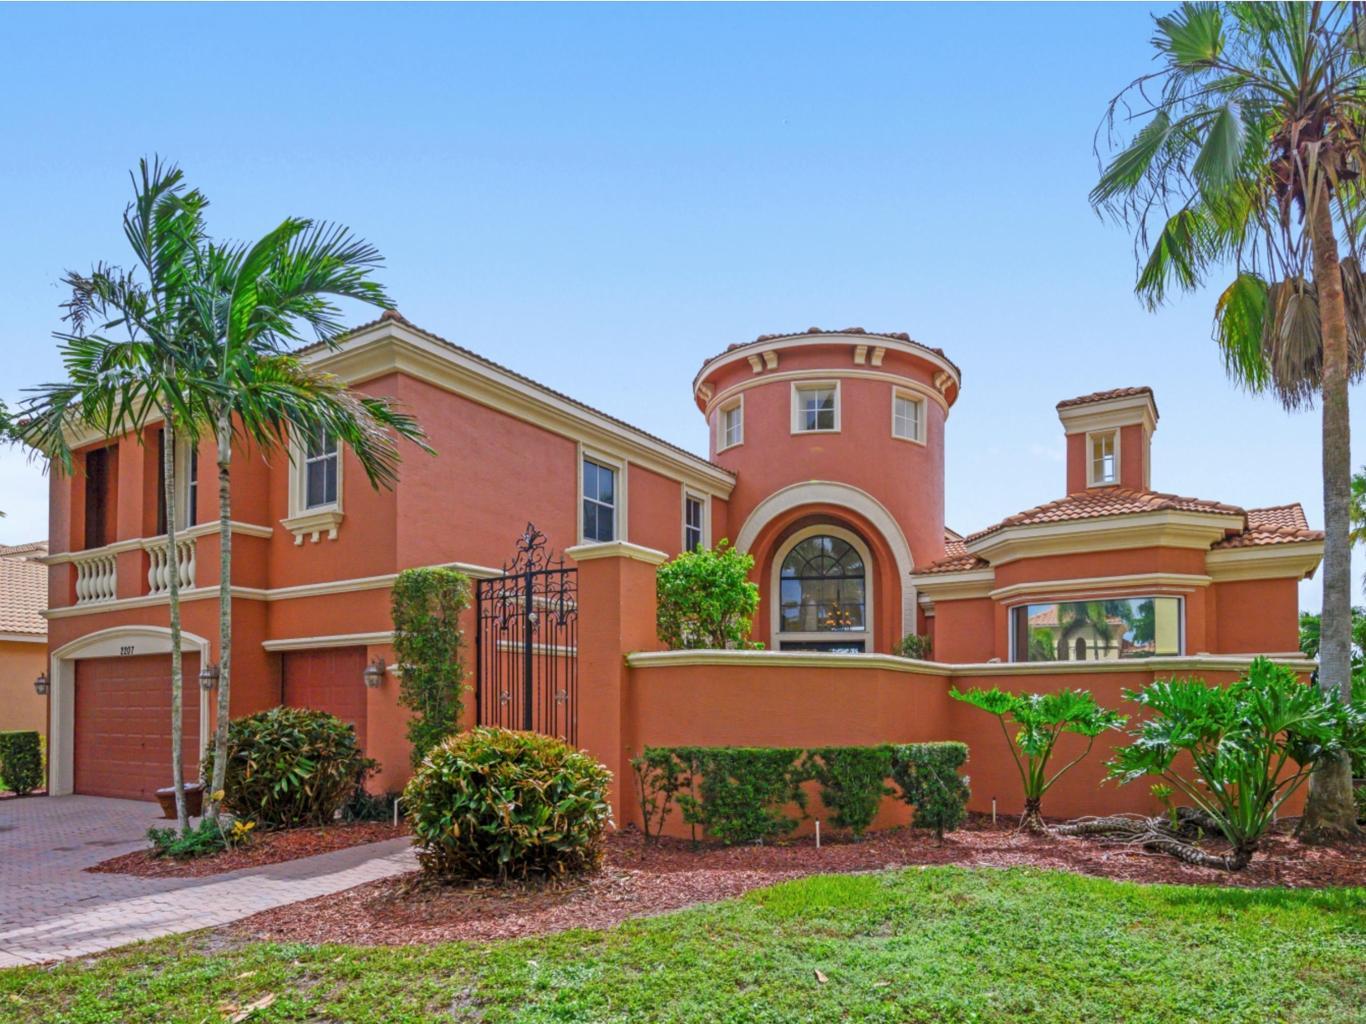 2207 Stotesbury Way, Wellington, Florida 33414, 6 Bedrooms Bedrooms, ,6.1 BathroomsBathrooms,Single Family,For Sale,Stotesbury,RX-10649679